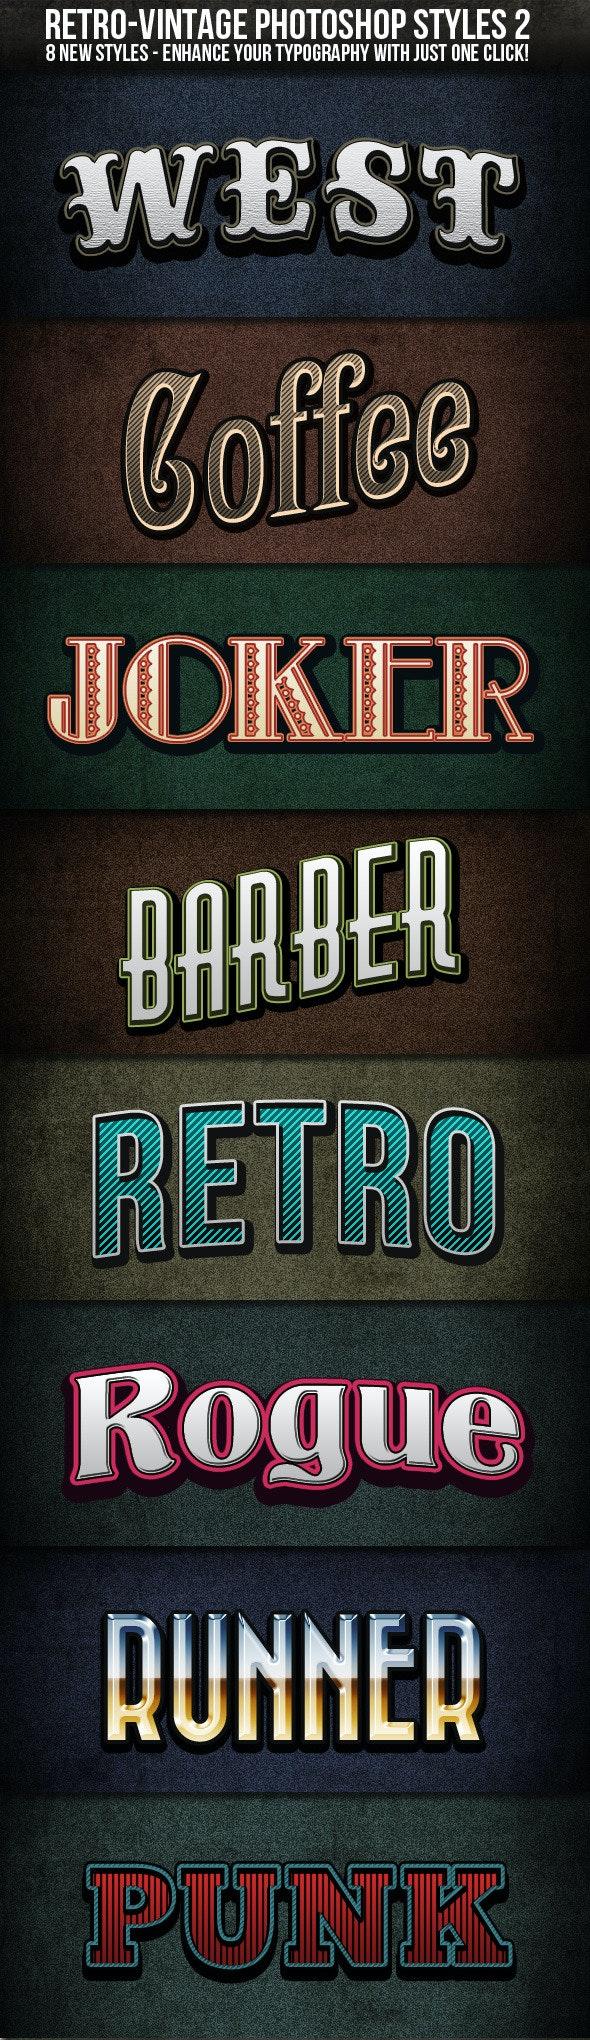 Retro-Vintage Styles 2 - Photoshop Add-ons